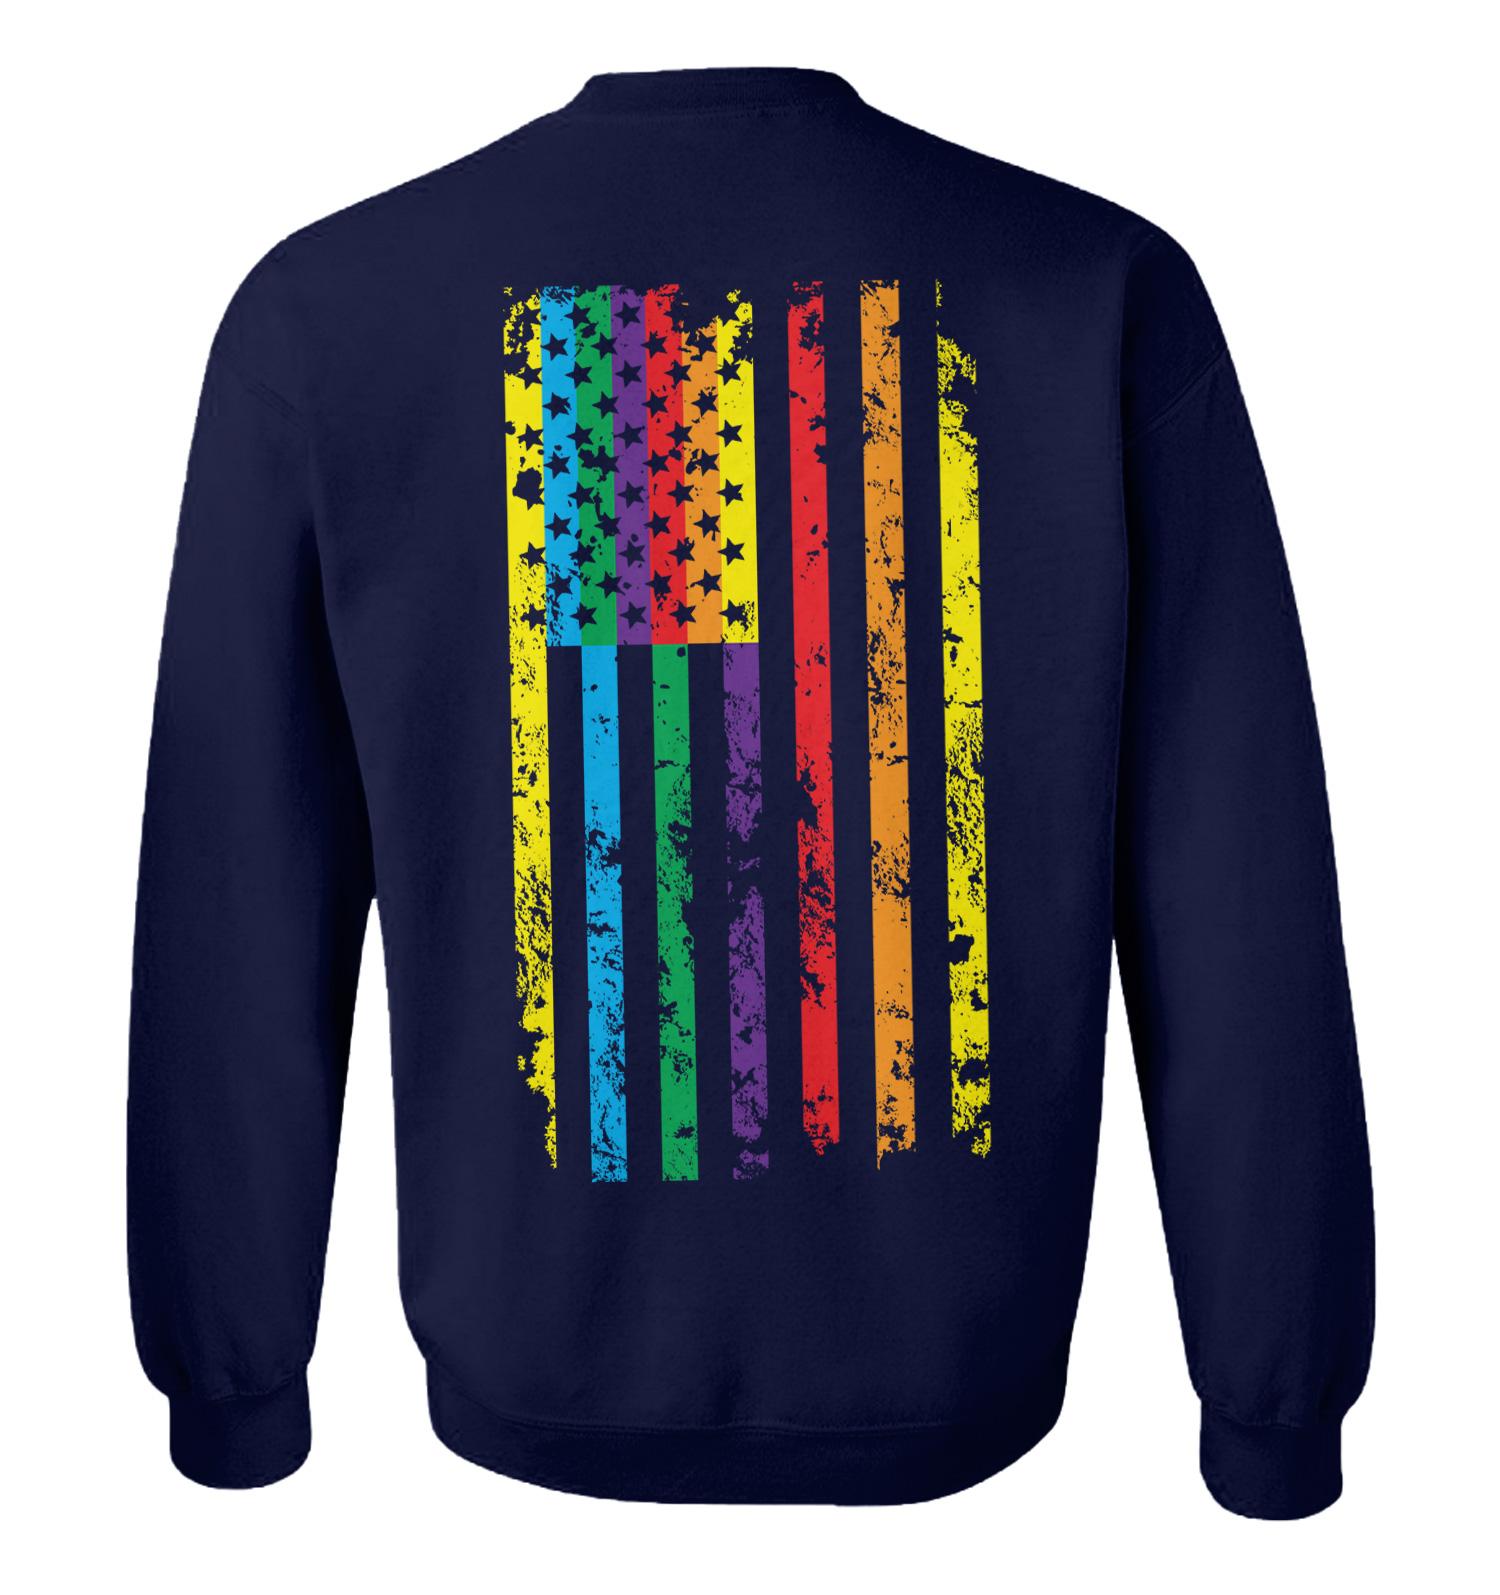 Distressed Rainbow Flag Hoodies Gay Pride Equal Rights Sweatshirts